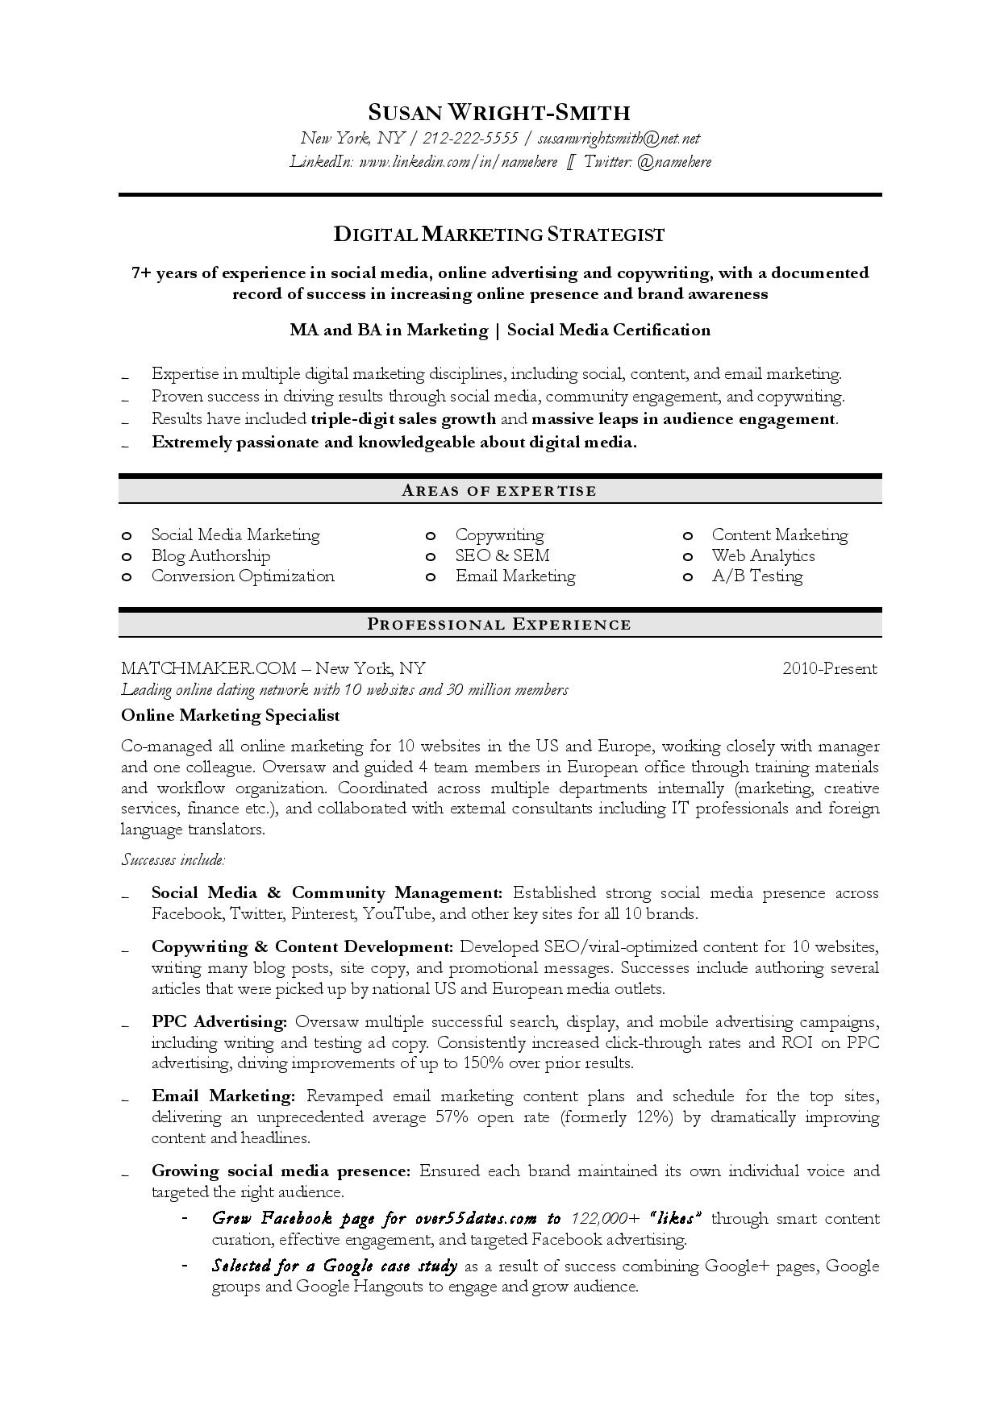 Digital Marketing Strategist Resume Sample Marketing Resume Digital Marketing Chronological Resume